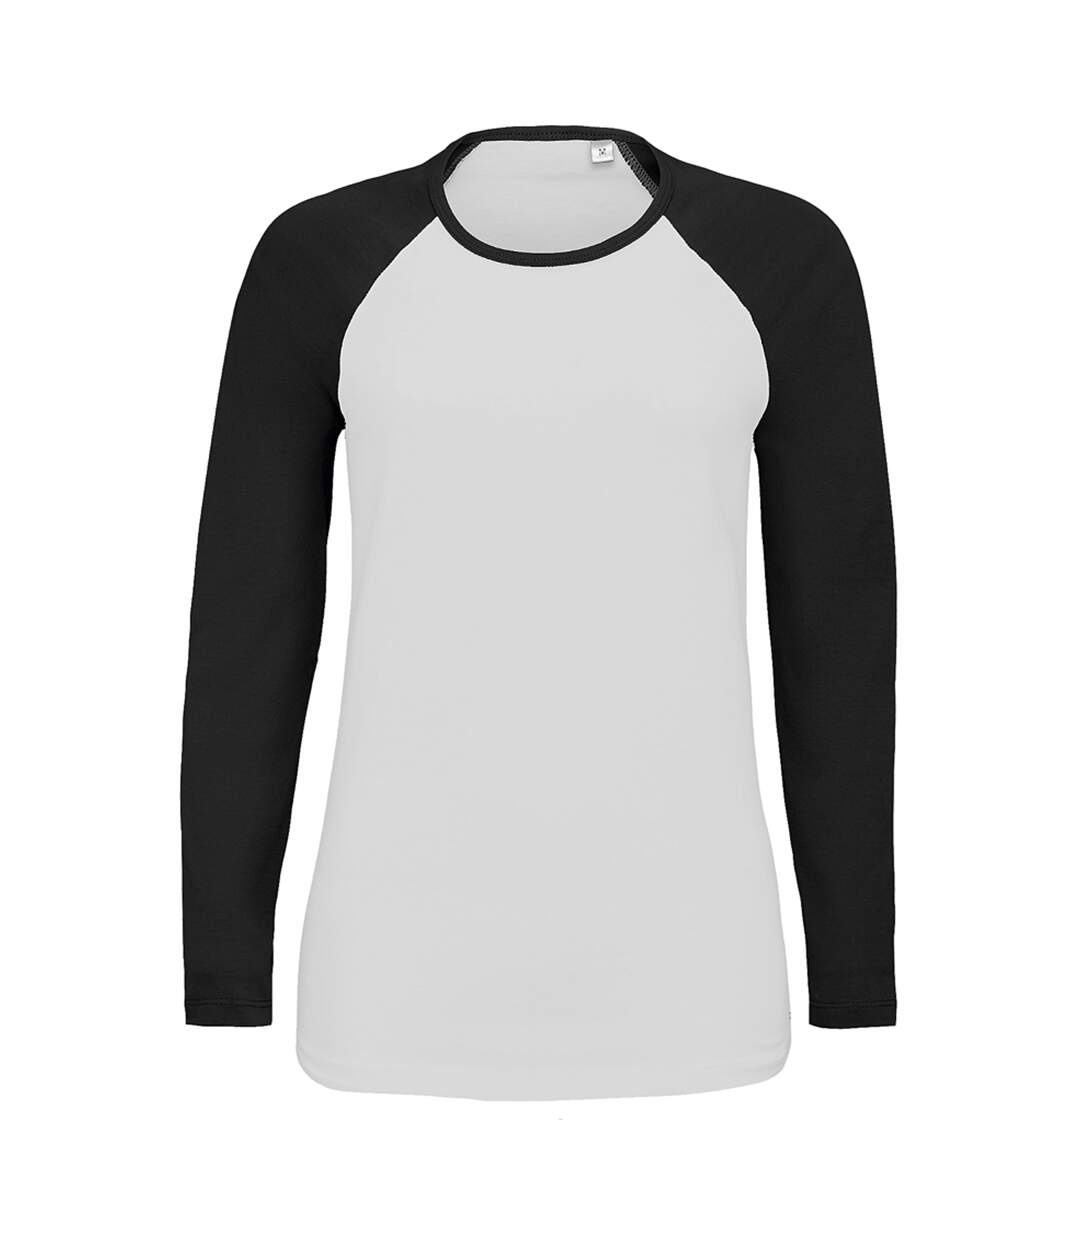 Sols - Tee-Shirt Milky - Femme (Blanc/Noir) - UTPC3514